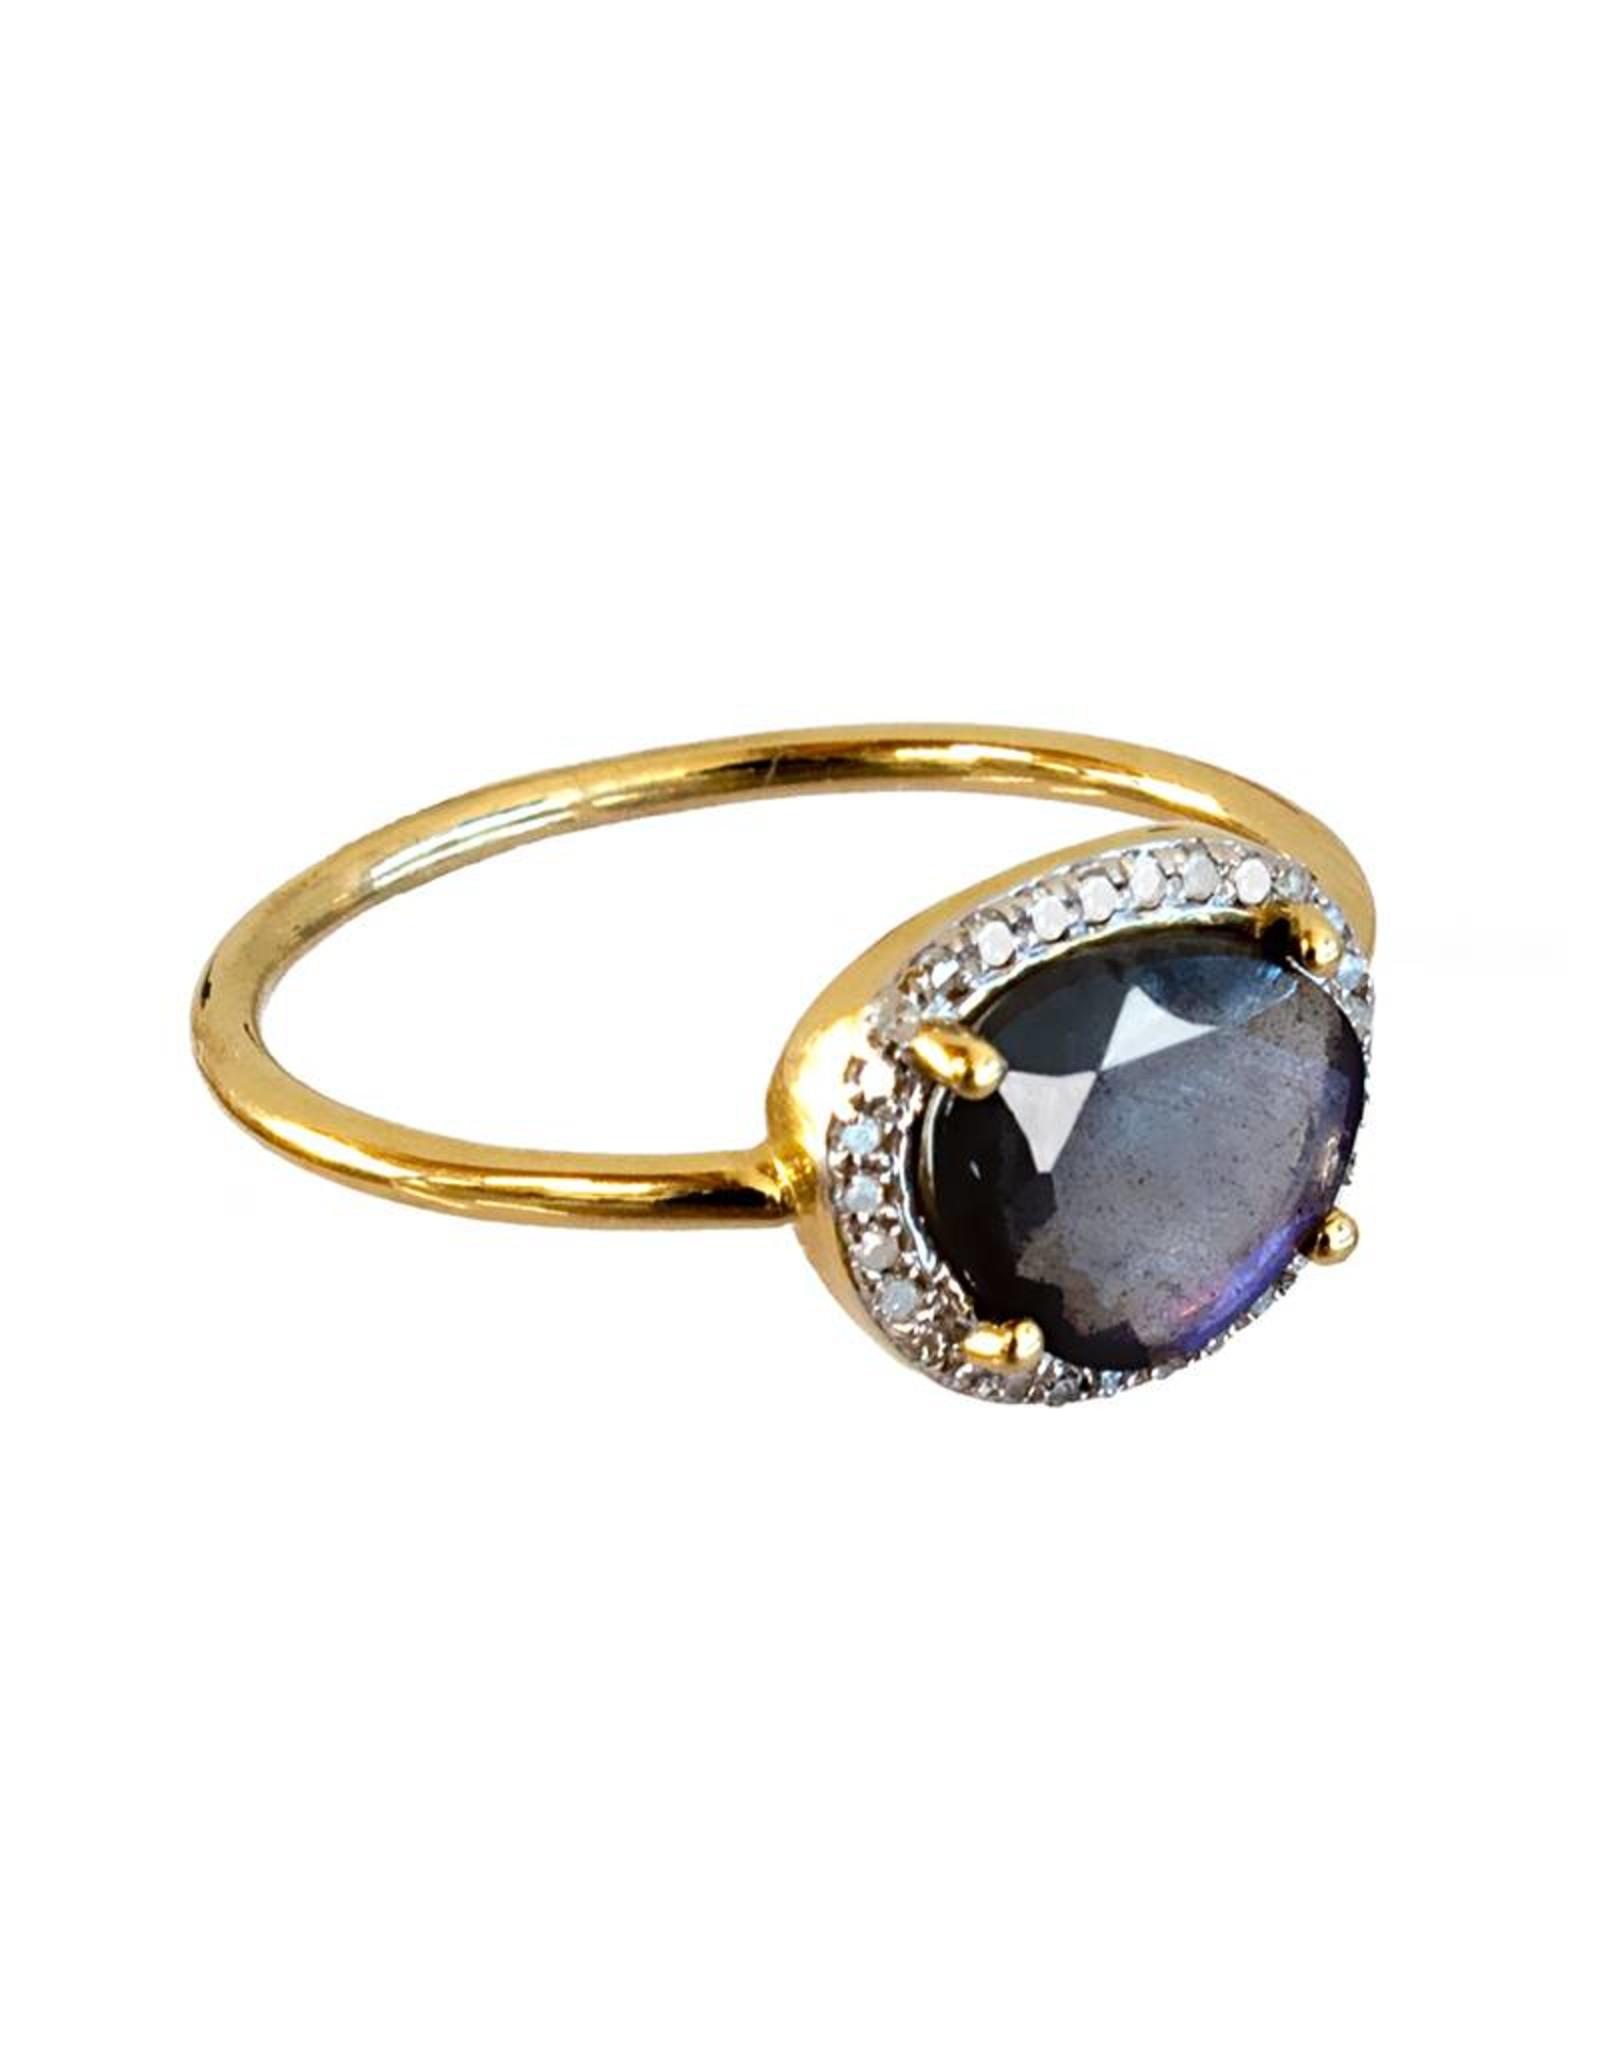 Bo Gold Ring - Gold - Labradorite - Diamonds